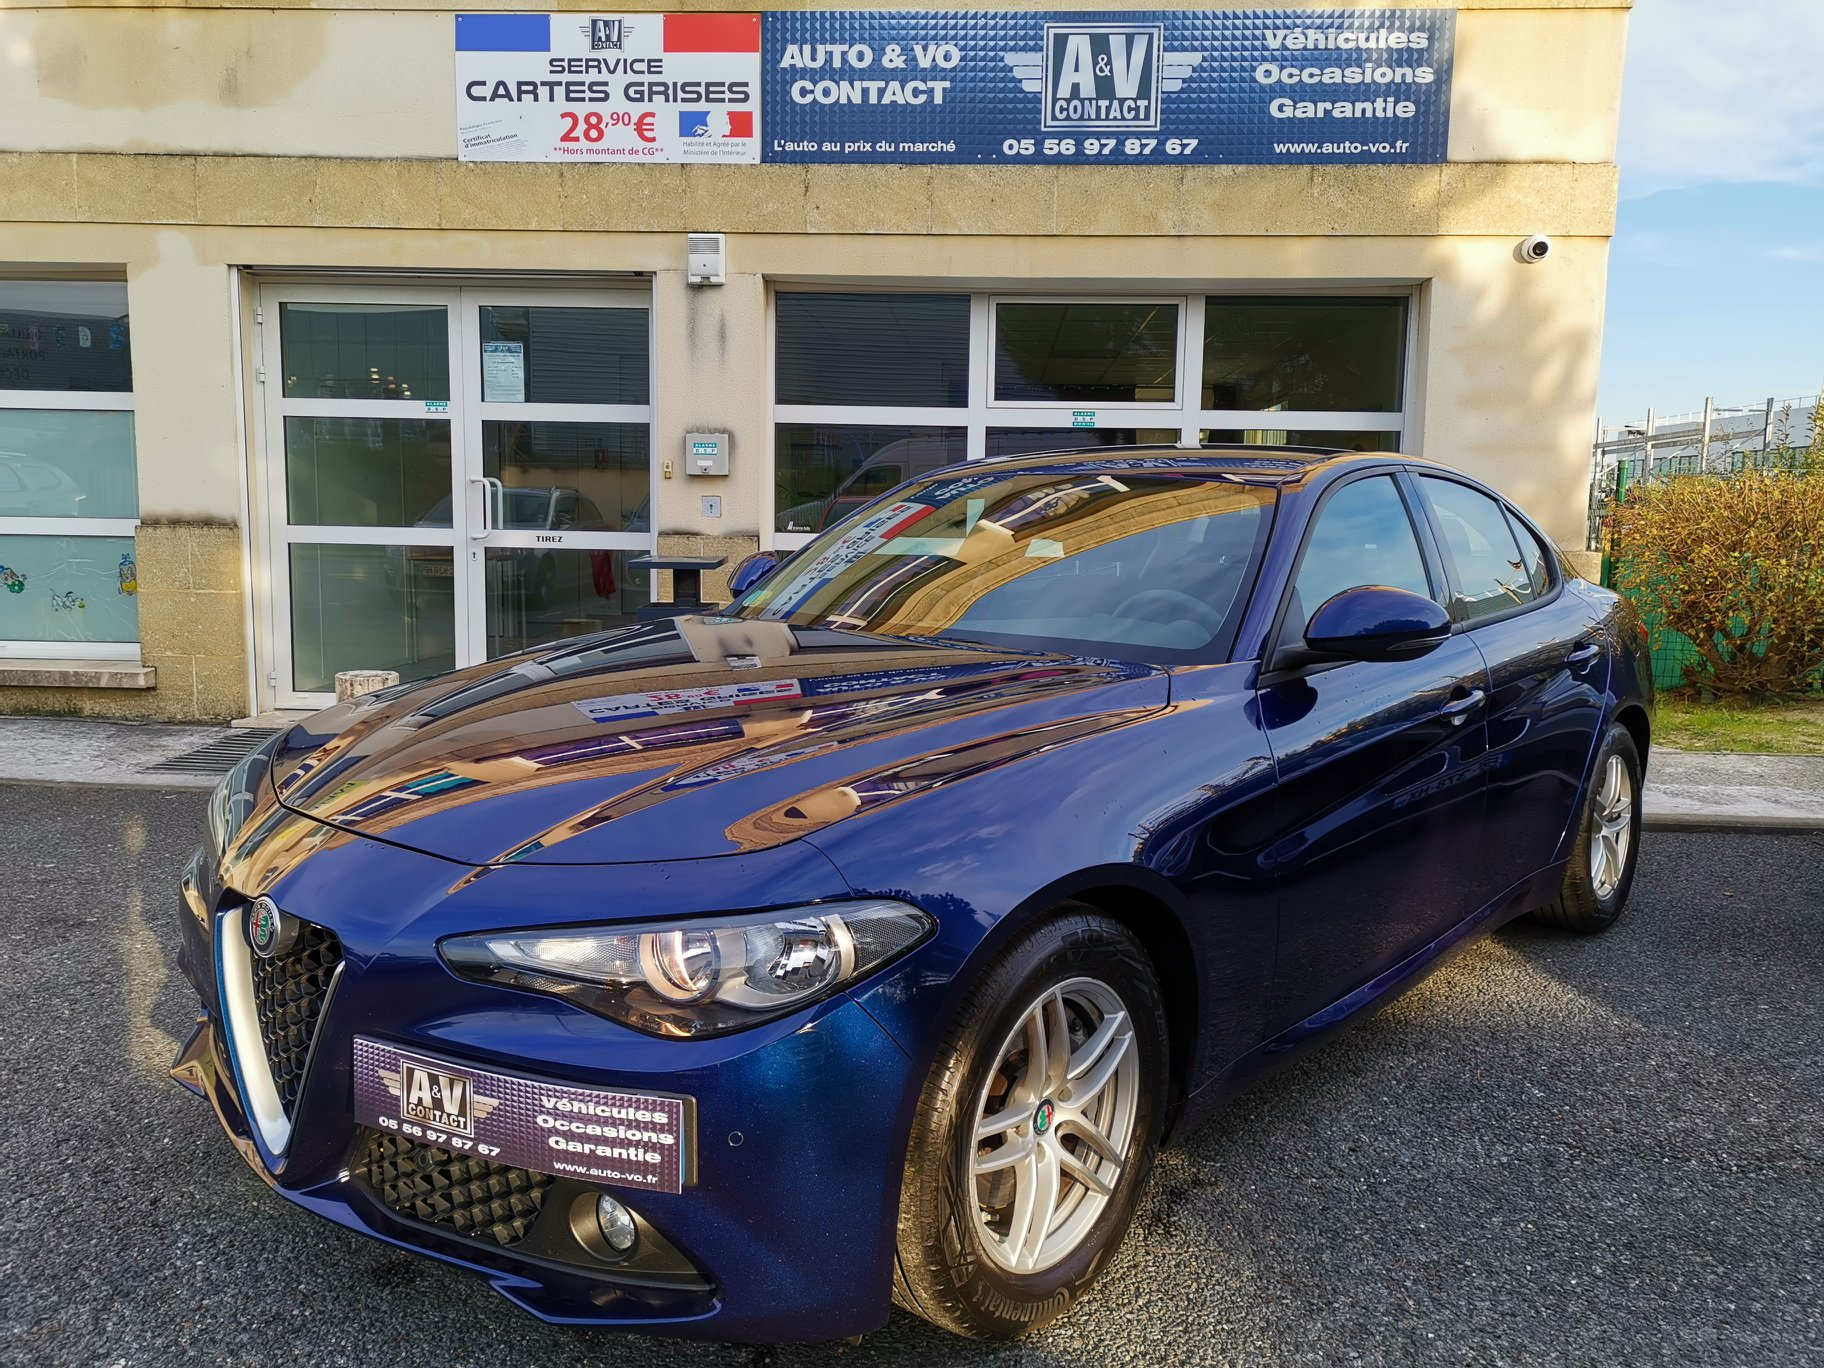 ALFA ROMEO GIULIA 2.2L JTD 16V 150 CH Du 02.09.2016 – 58 540 KMS – 19 490€